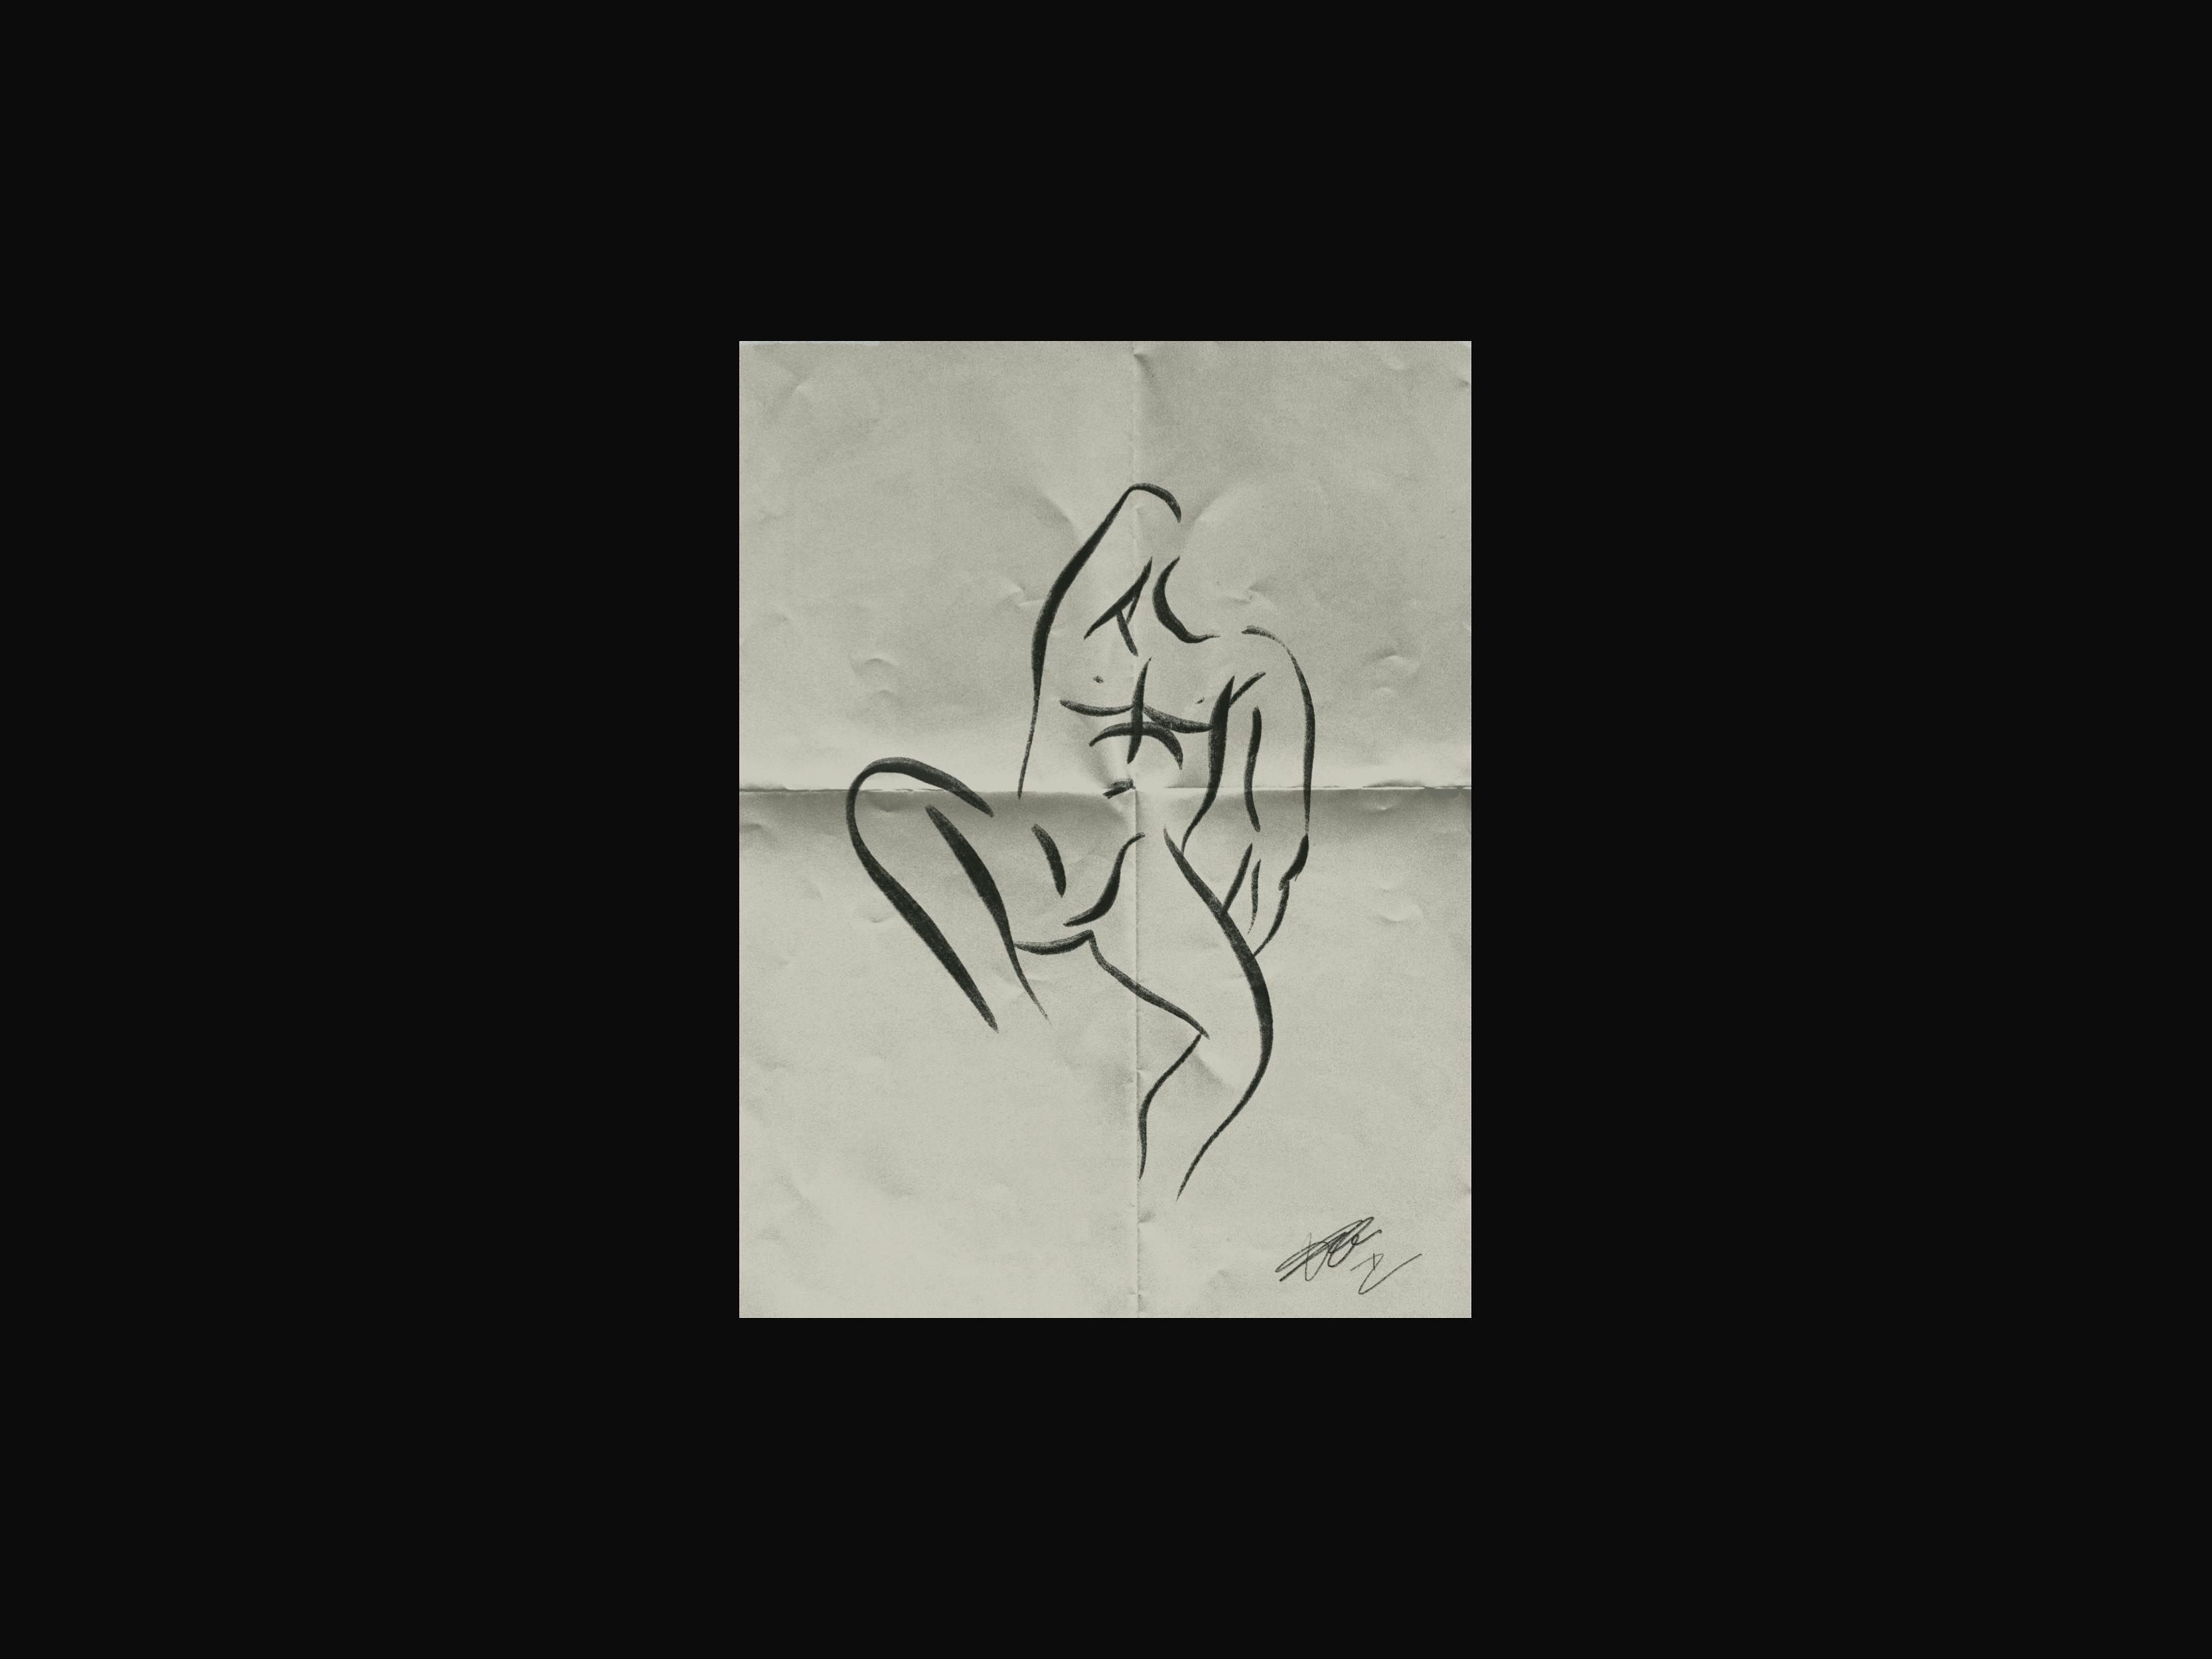 Untitled 7 copy